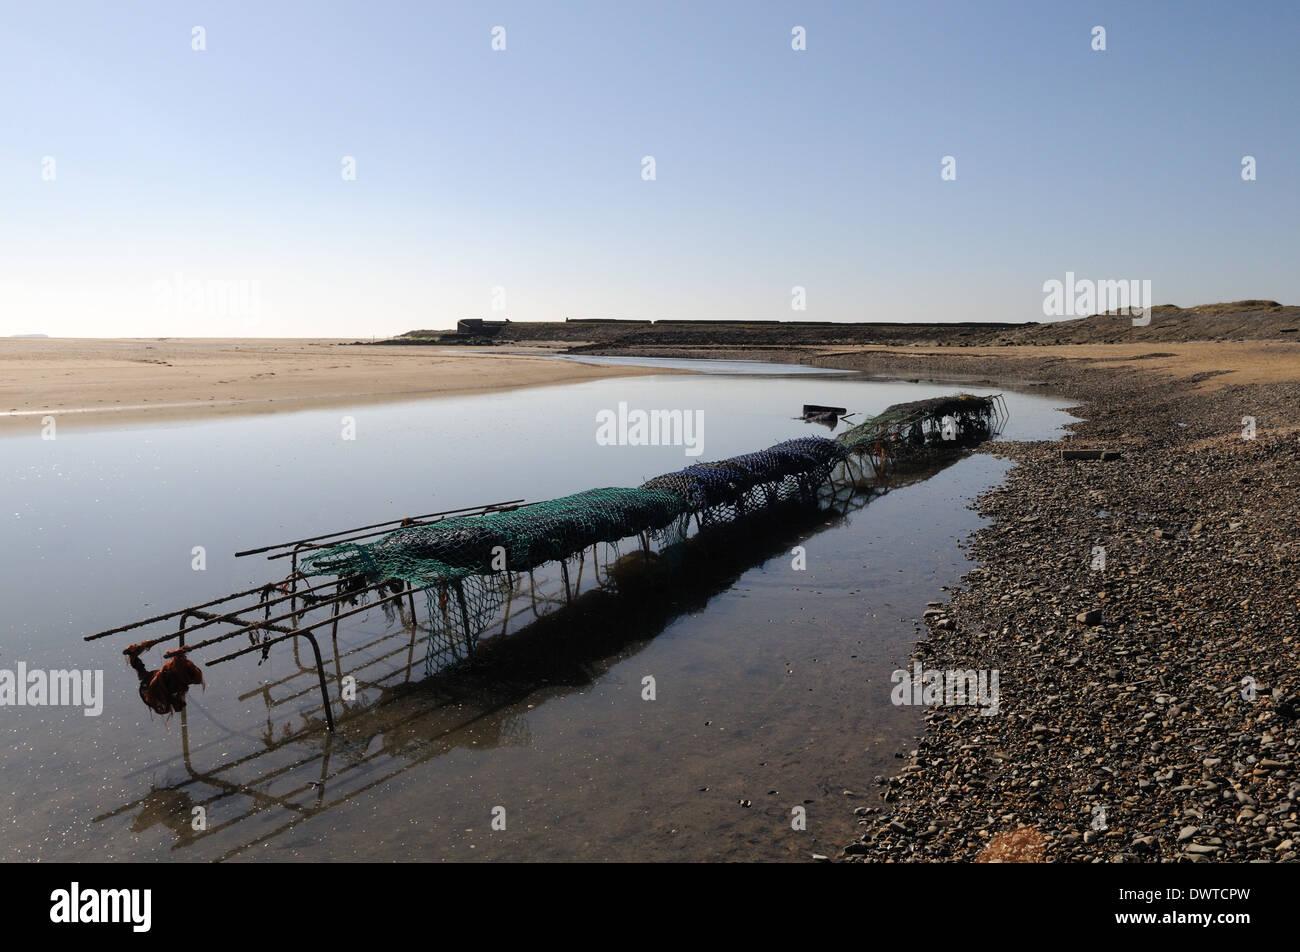 Sacks of mussels on a wire rack Burry Estuary Burry Port Carmrthenshire Wales Cymru UK GB Stock Photo